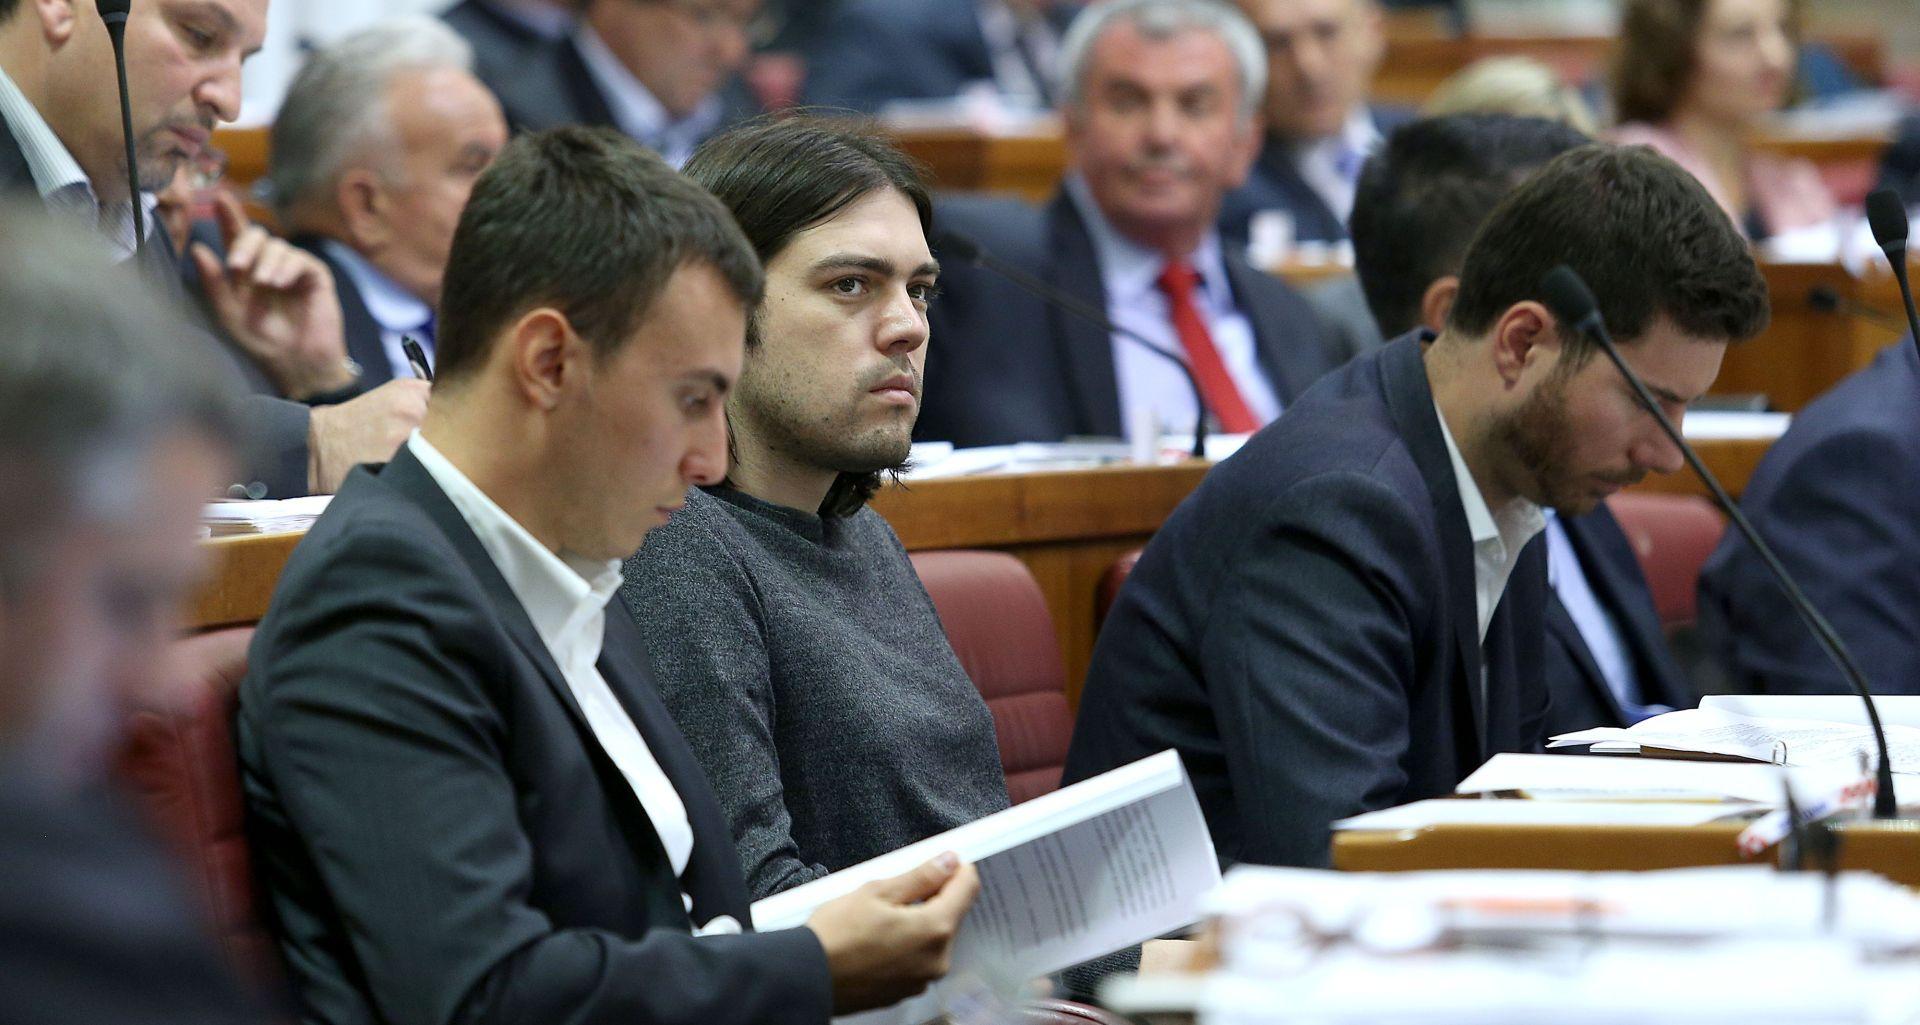 Sabor raspravljao o zakonu o vodnom gospodarstvu, Živi zid prozvao Todorića